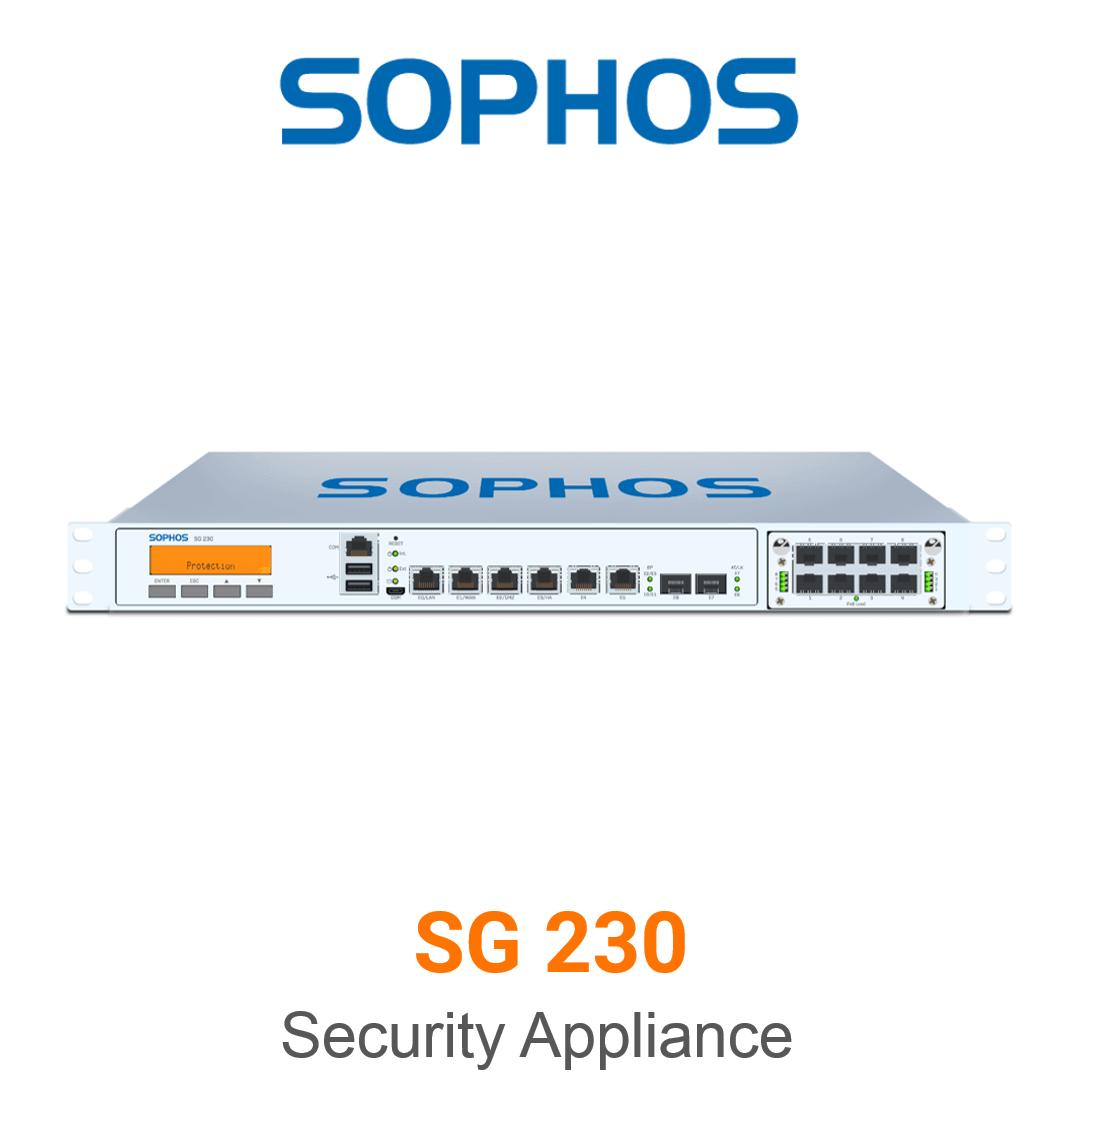 Sophos SG 230 Securiy Appliance